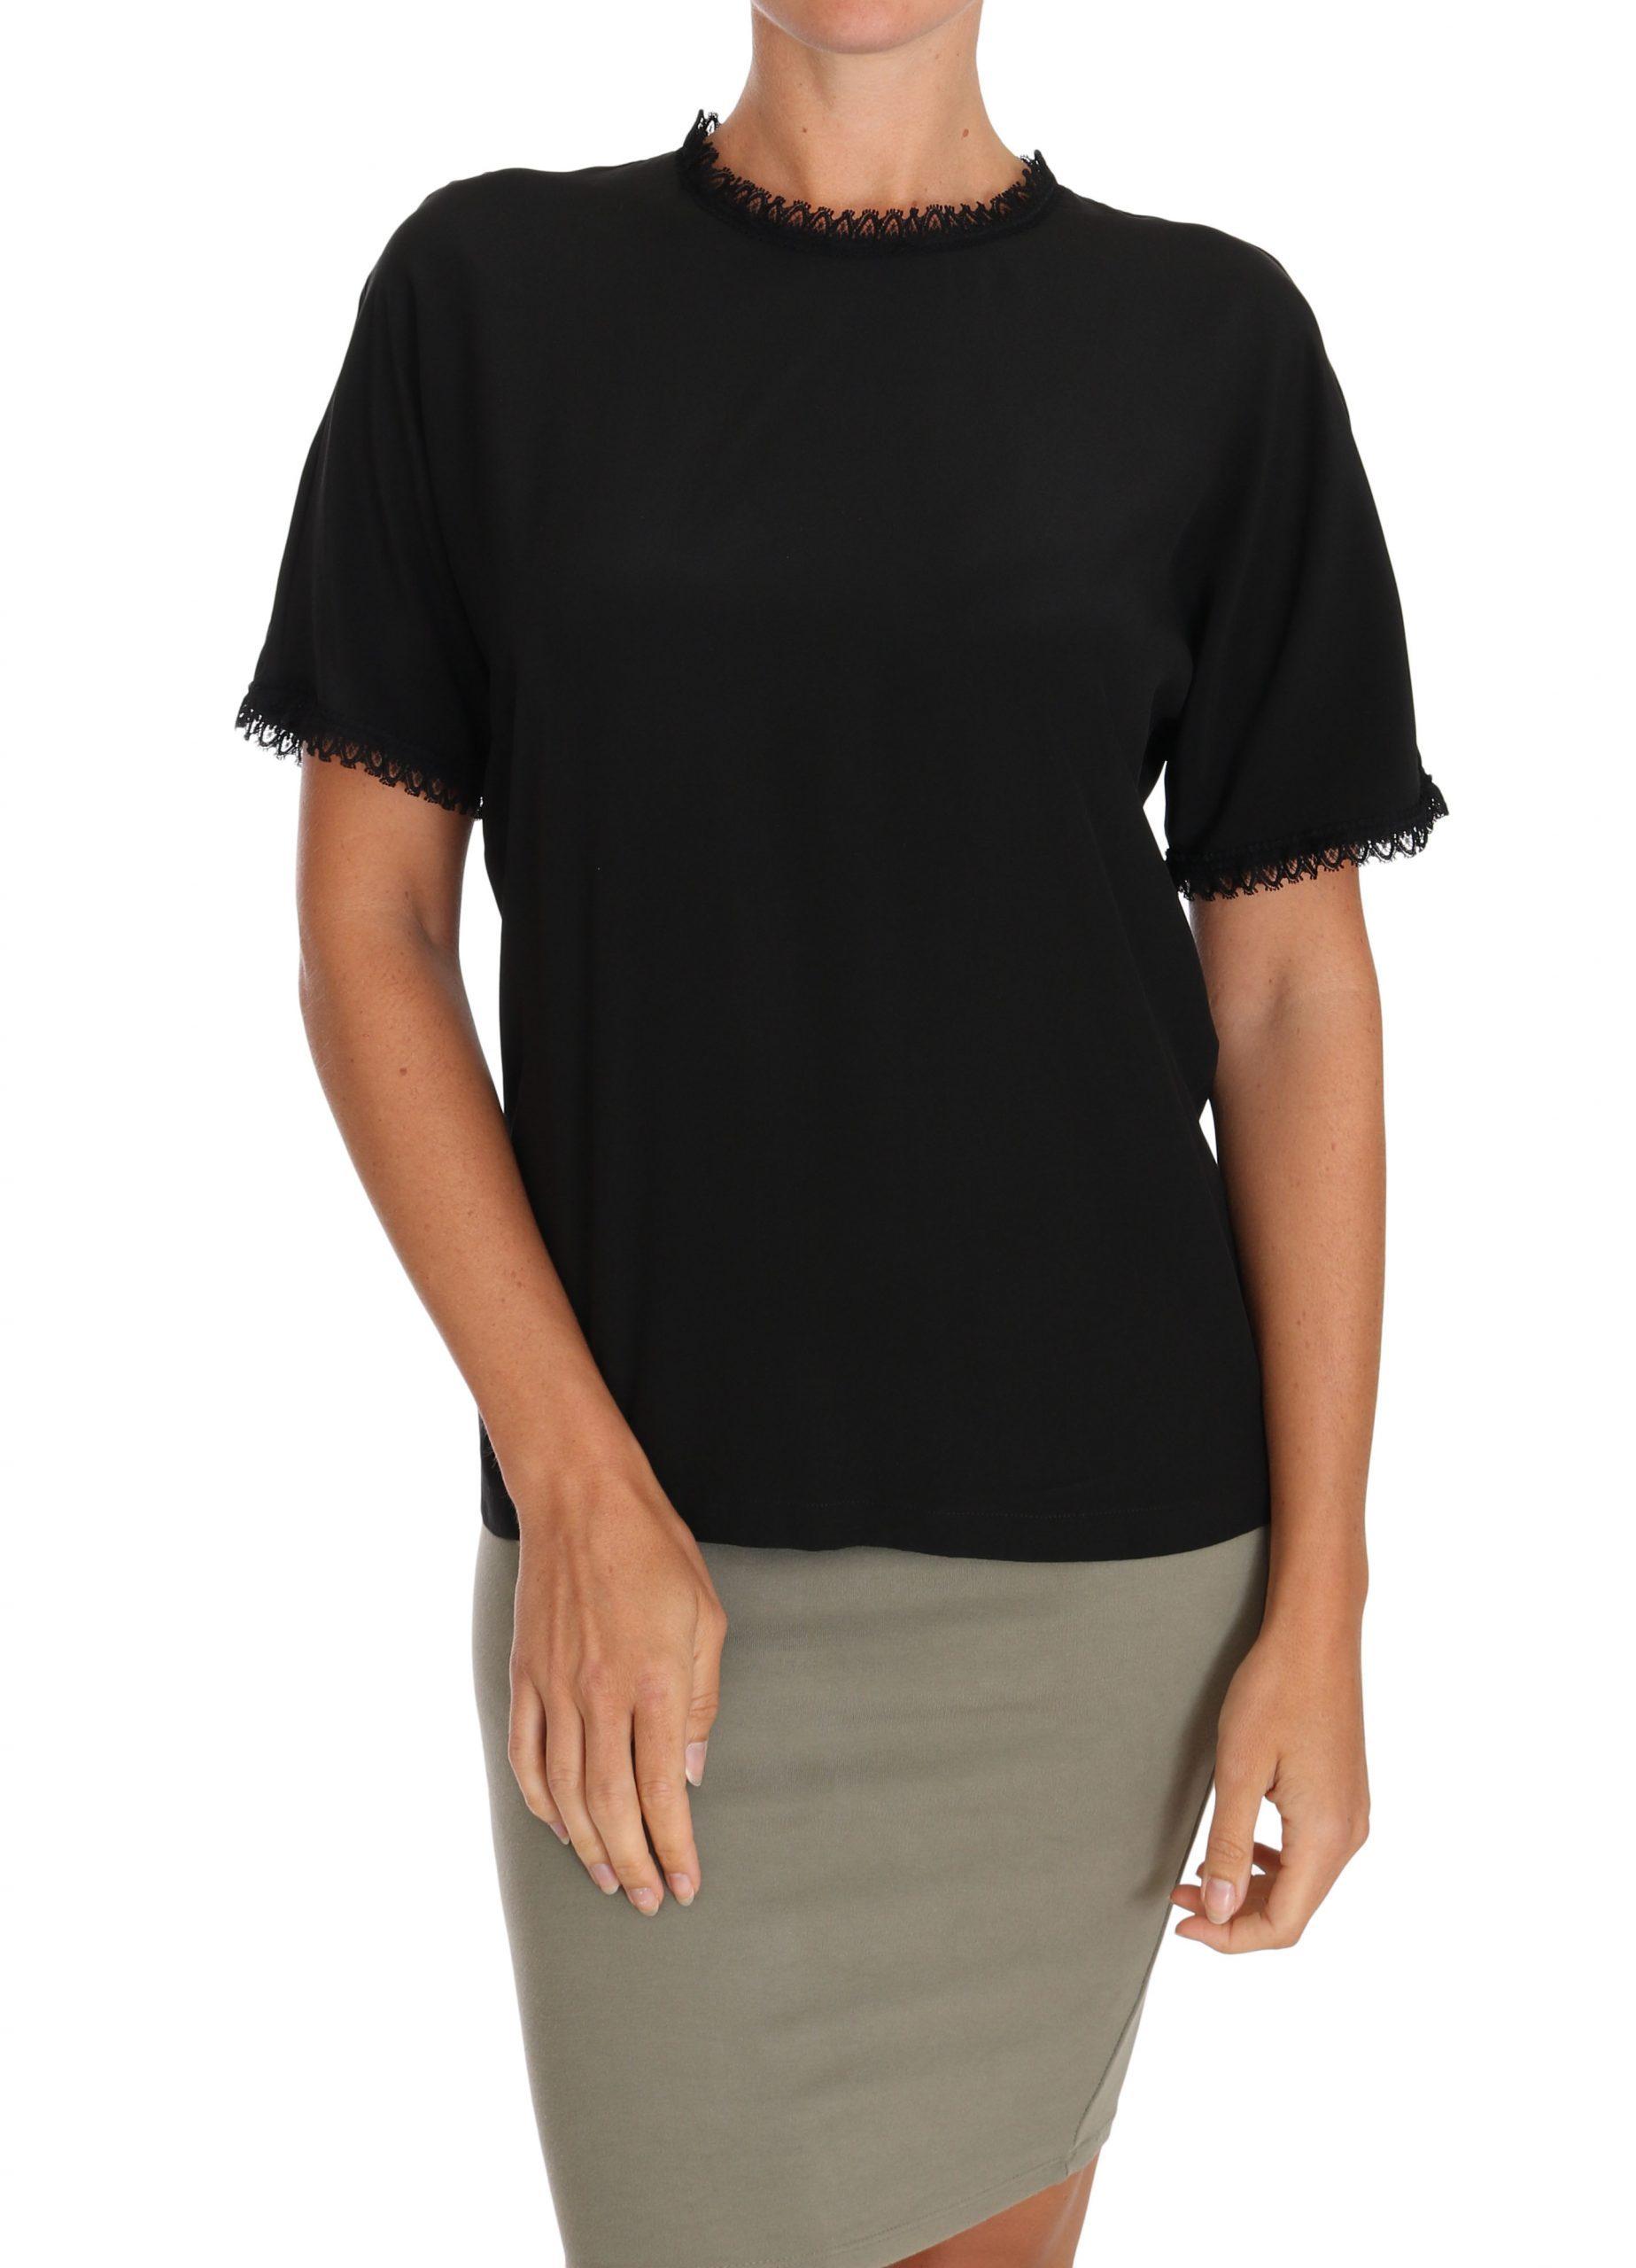 Black Silk Lace Top Blouse T-Shirt - IT38|XS